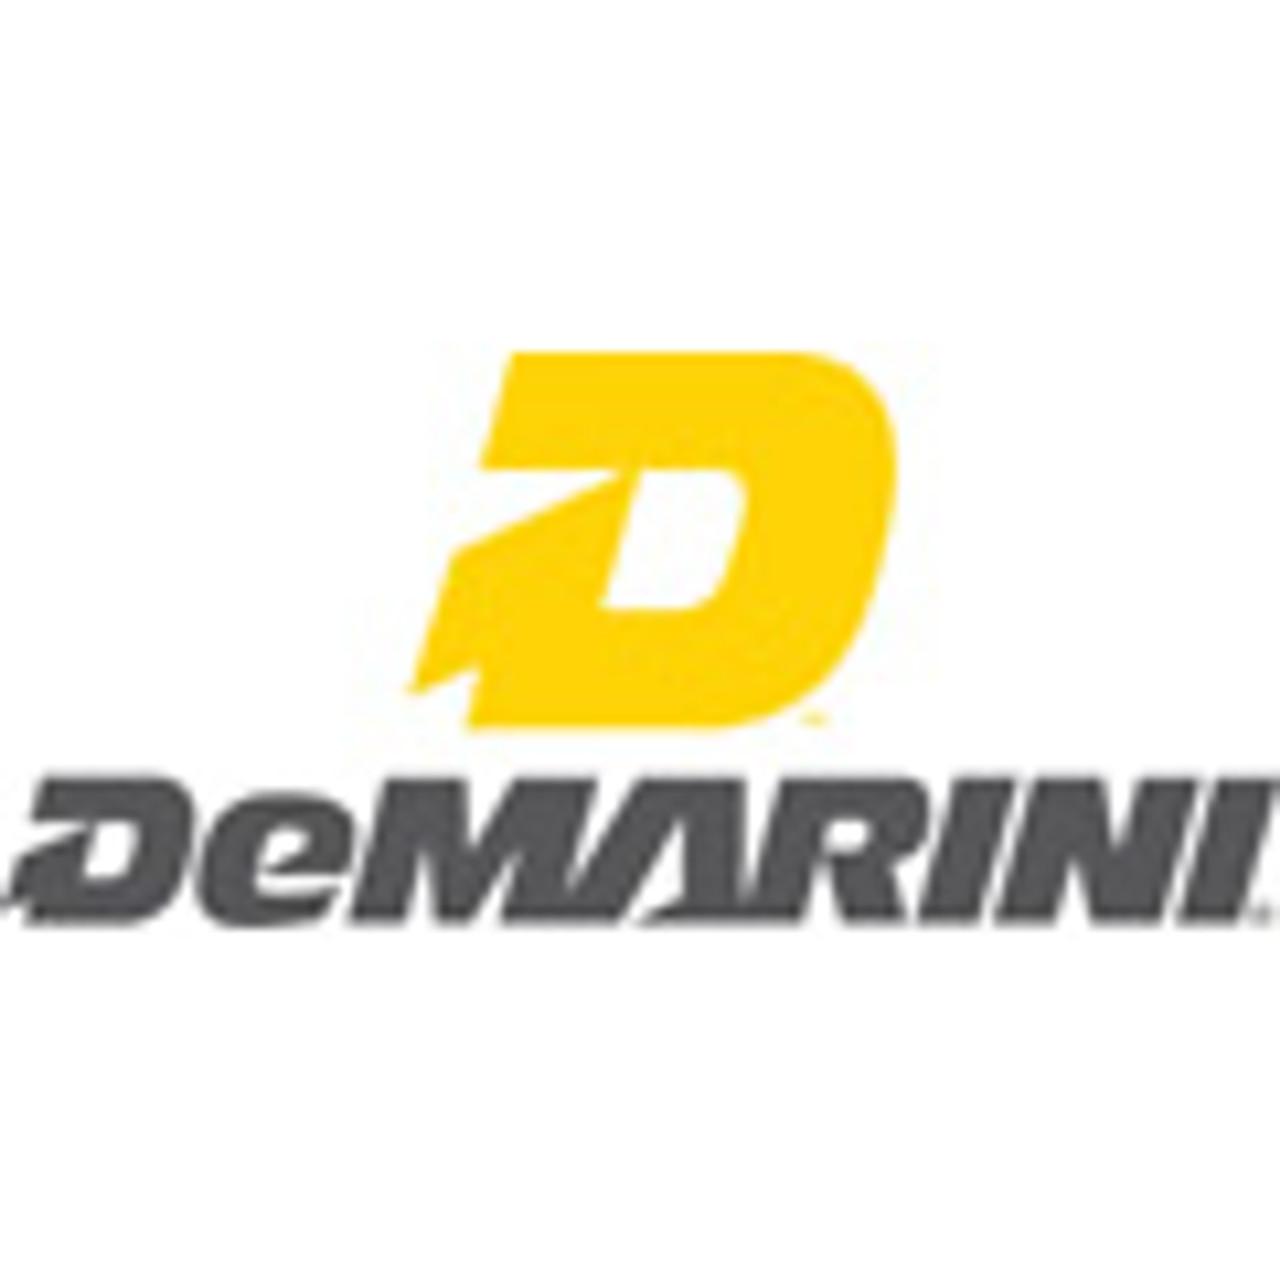 DeMarini Fastpitch Softball Bats